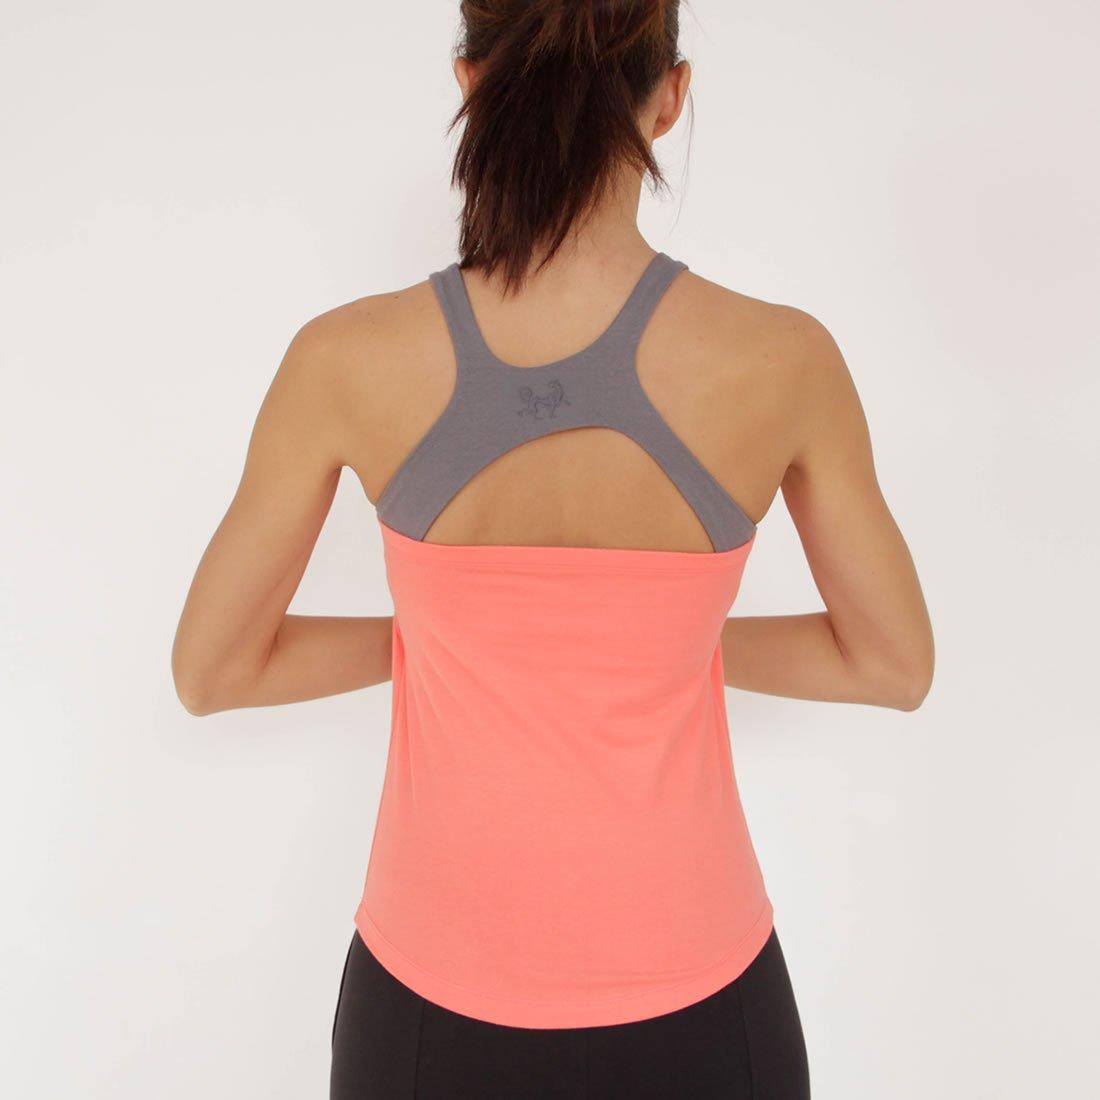 Prancing Leopard Damen Yoga, Workout Top PLATHE Ärmelloses Shirt in Bio Baumwolle - Fitness Tank mit Integriertem BH